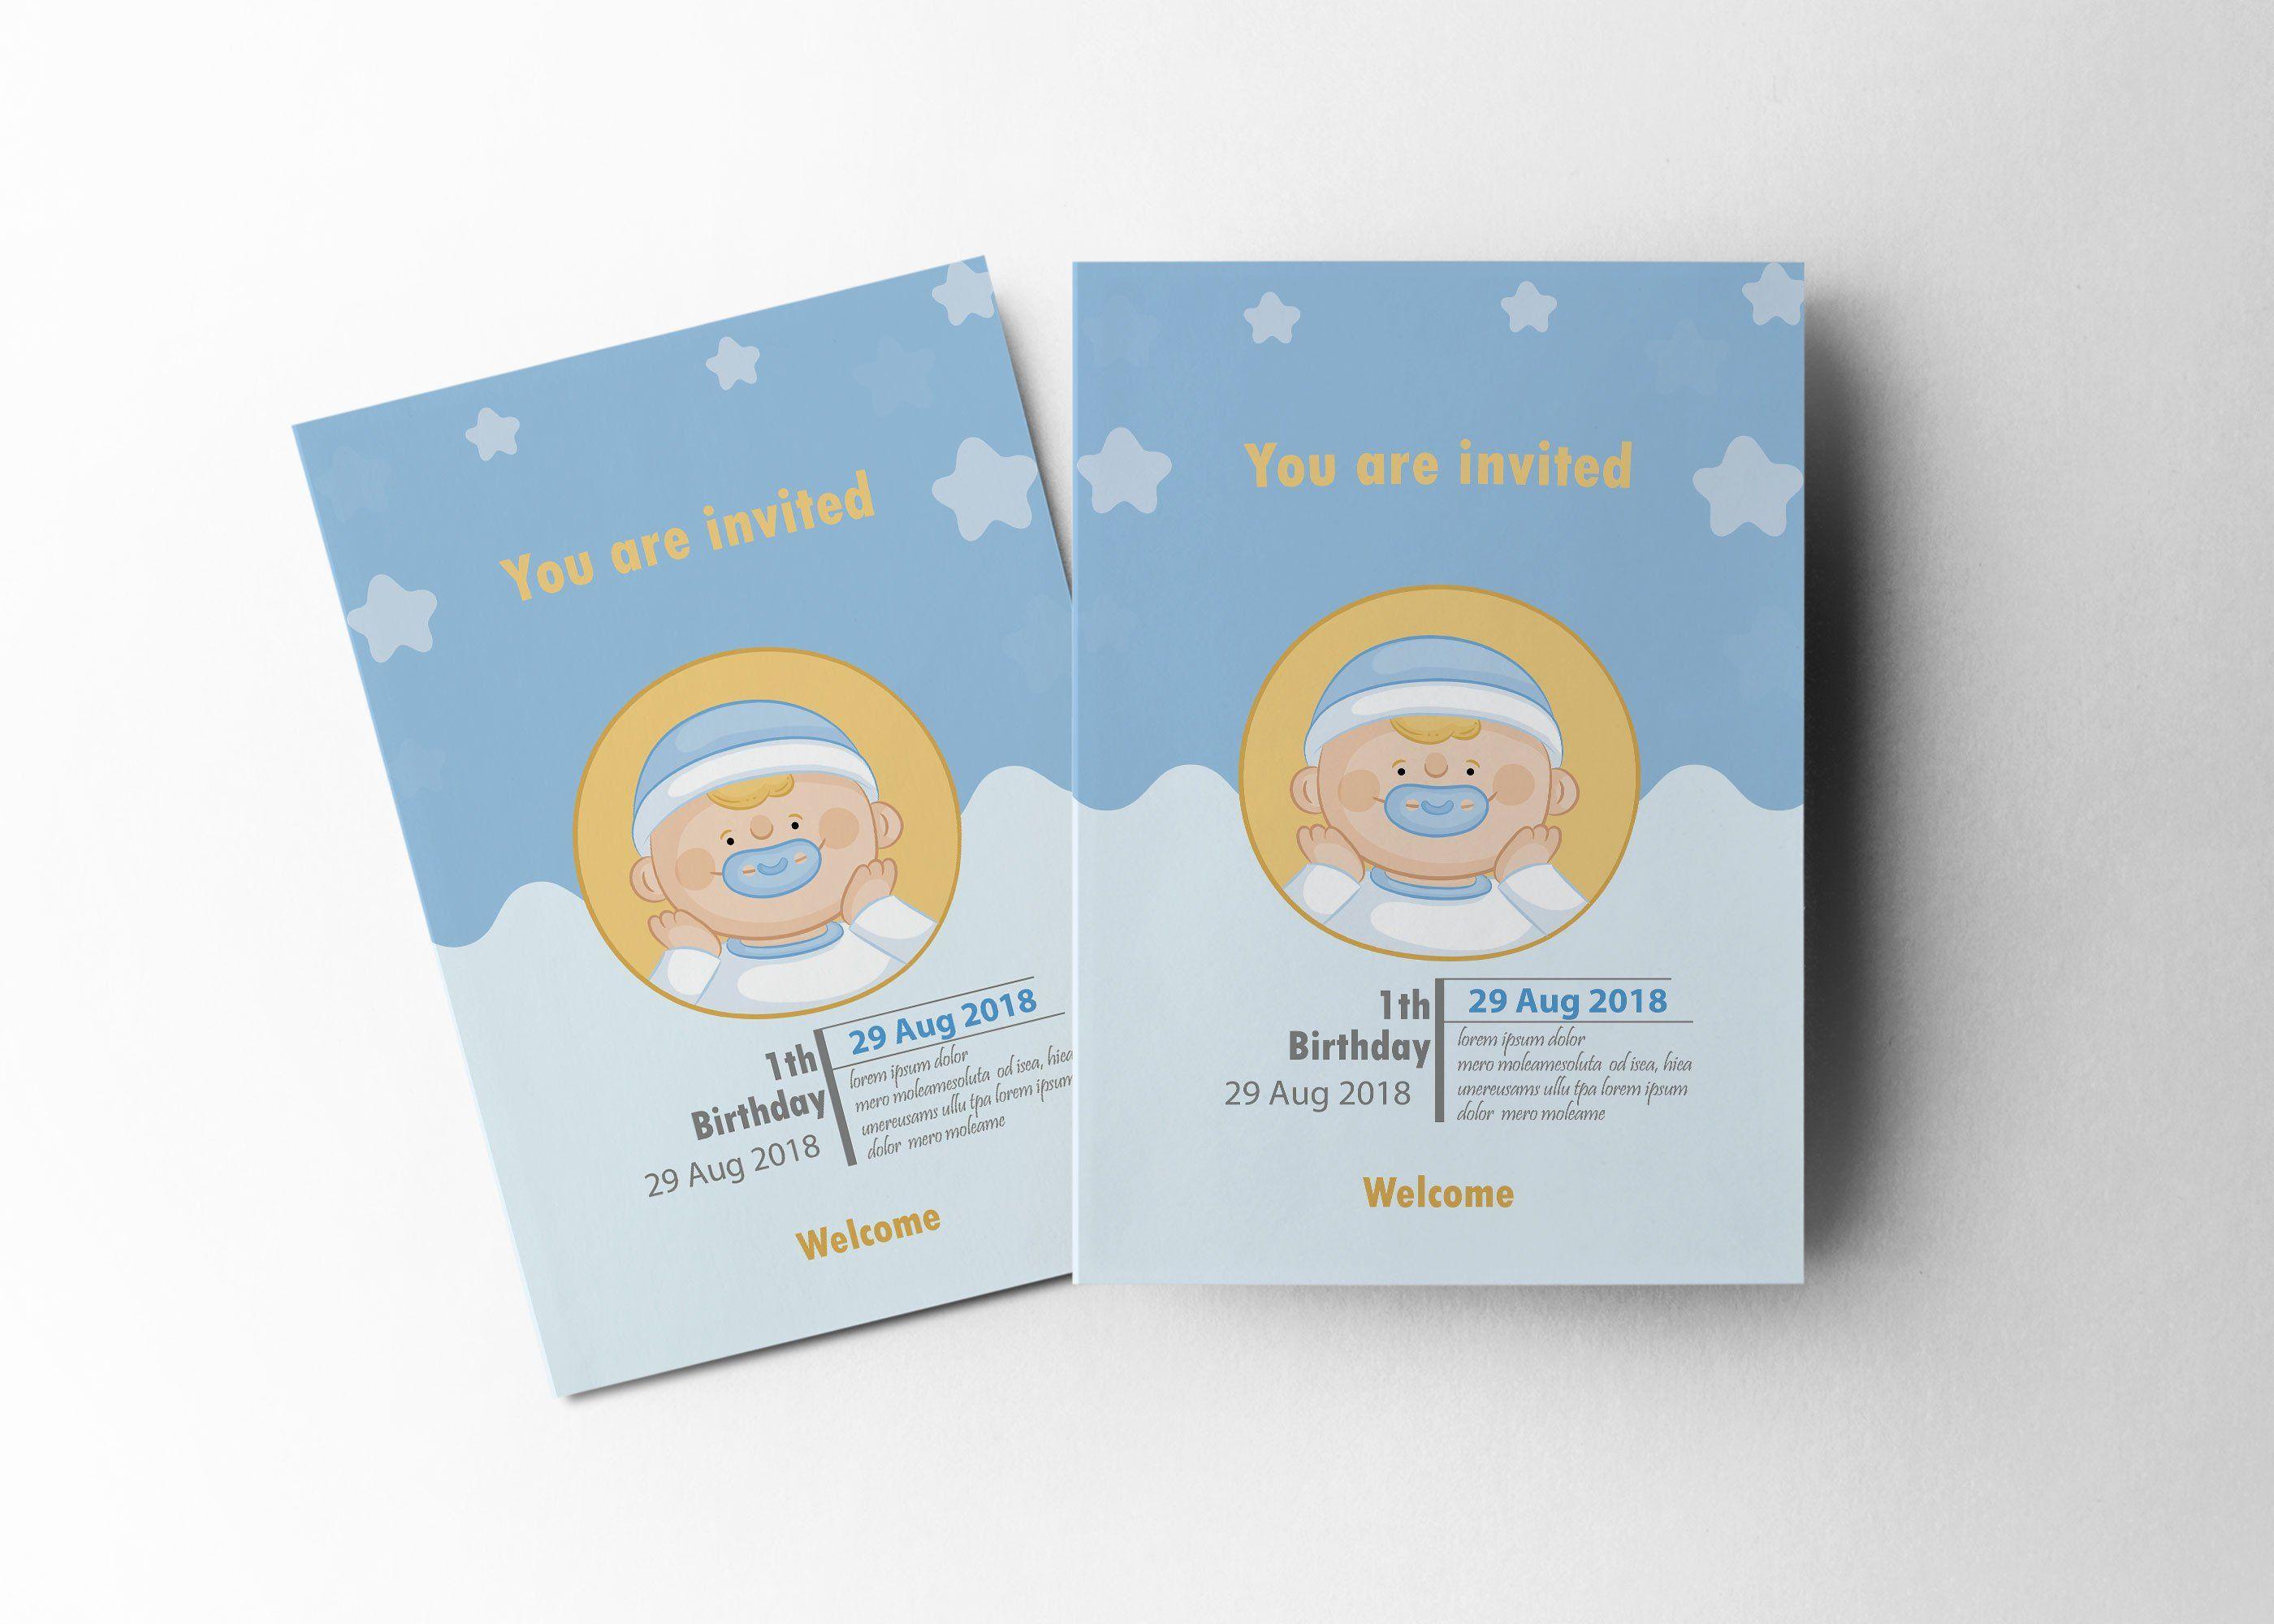 Baby Shower Flyer Template Unique Baby Shower Invitation Design T In 2020 Safari Baby Shower Invitations Gray Baby Shower Invitations Printable Baby Shower Invitations